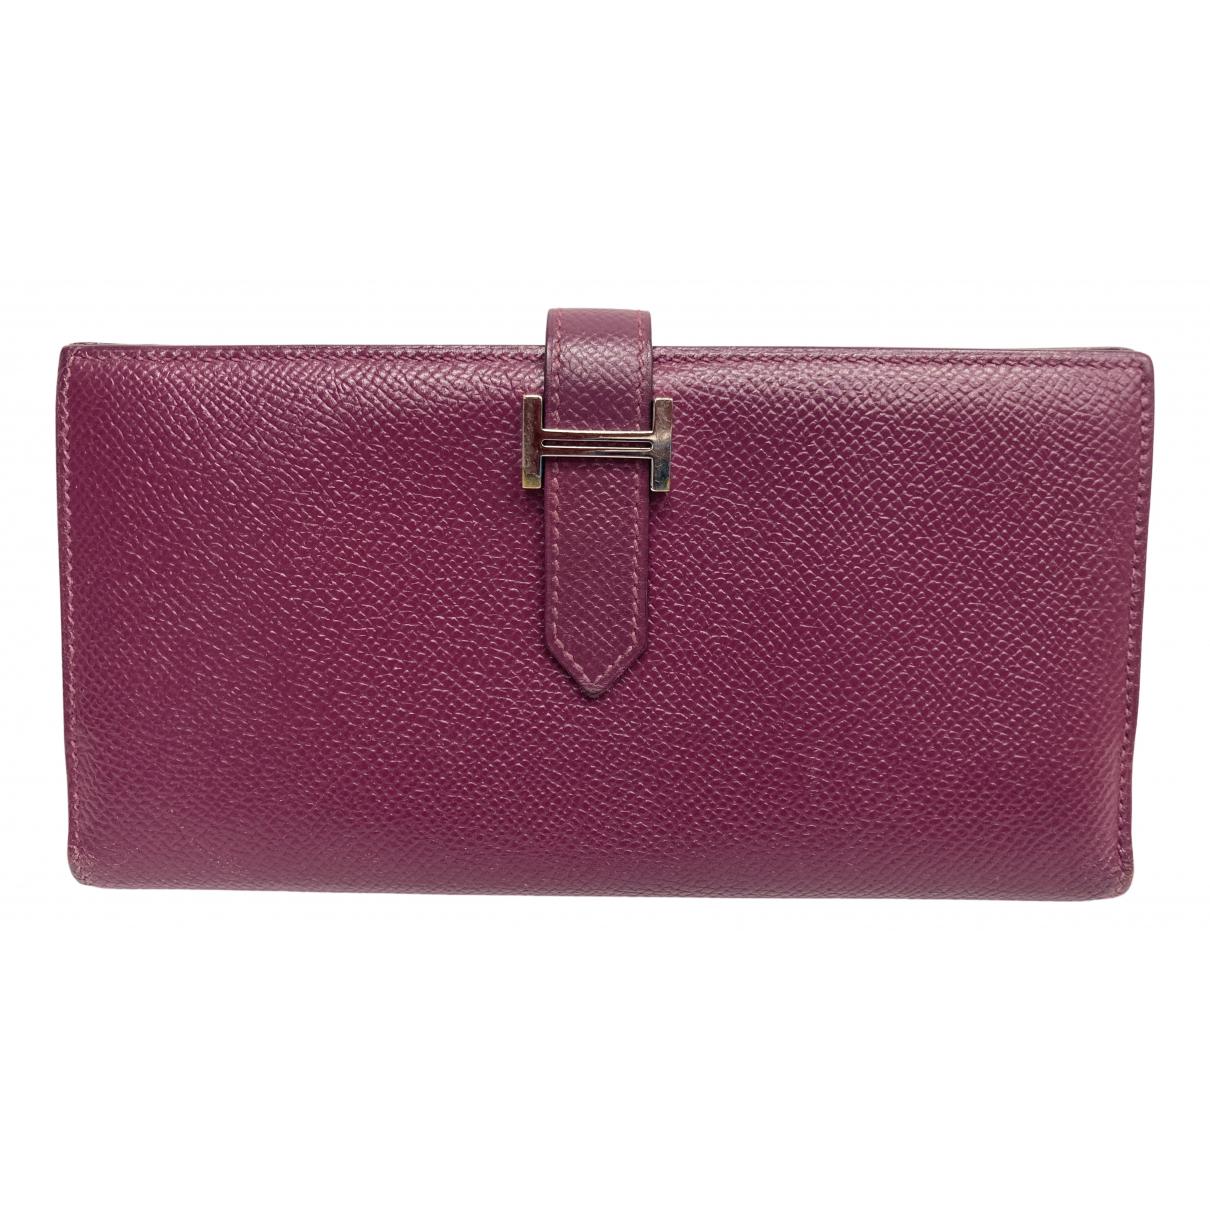 Hermes - Portefeuille Bearn pour femme en cuir - violet